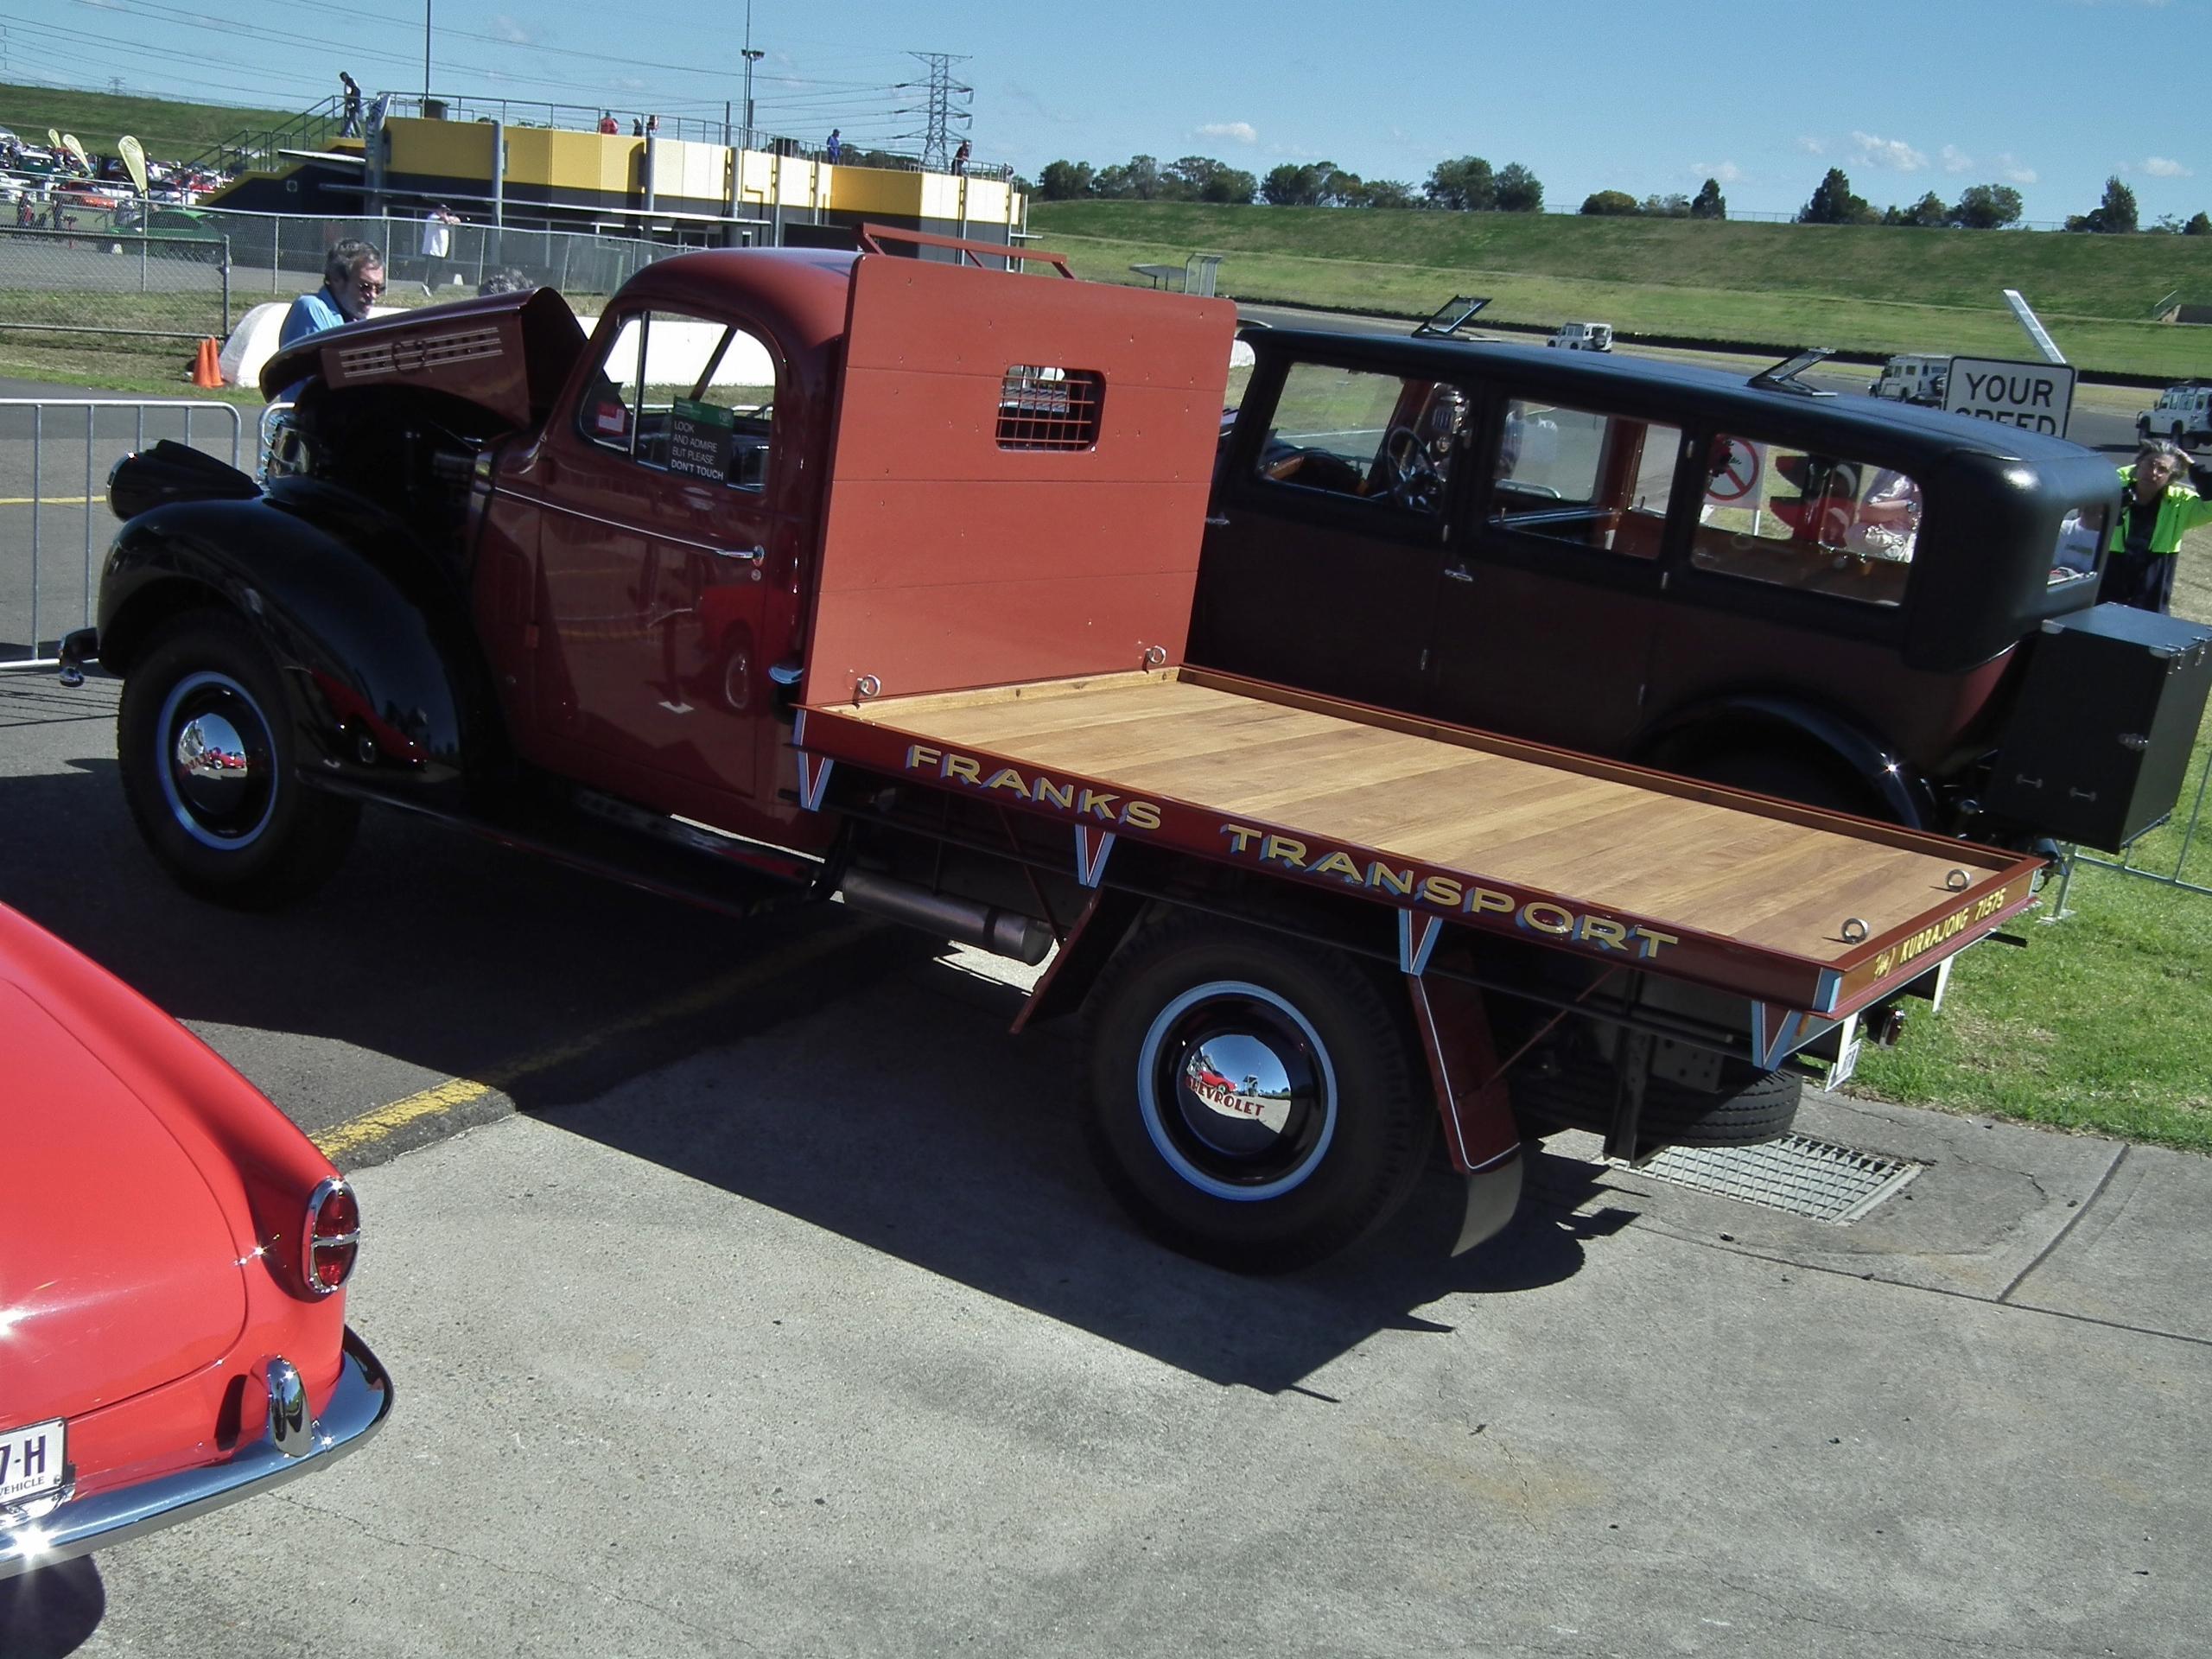 File:1946 Chevrolet table top truck (9597923570).jpg - Wikimedia Commons